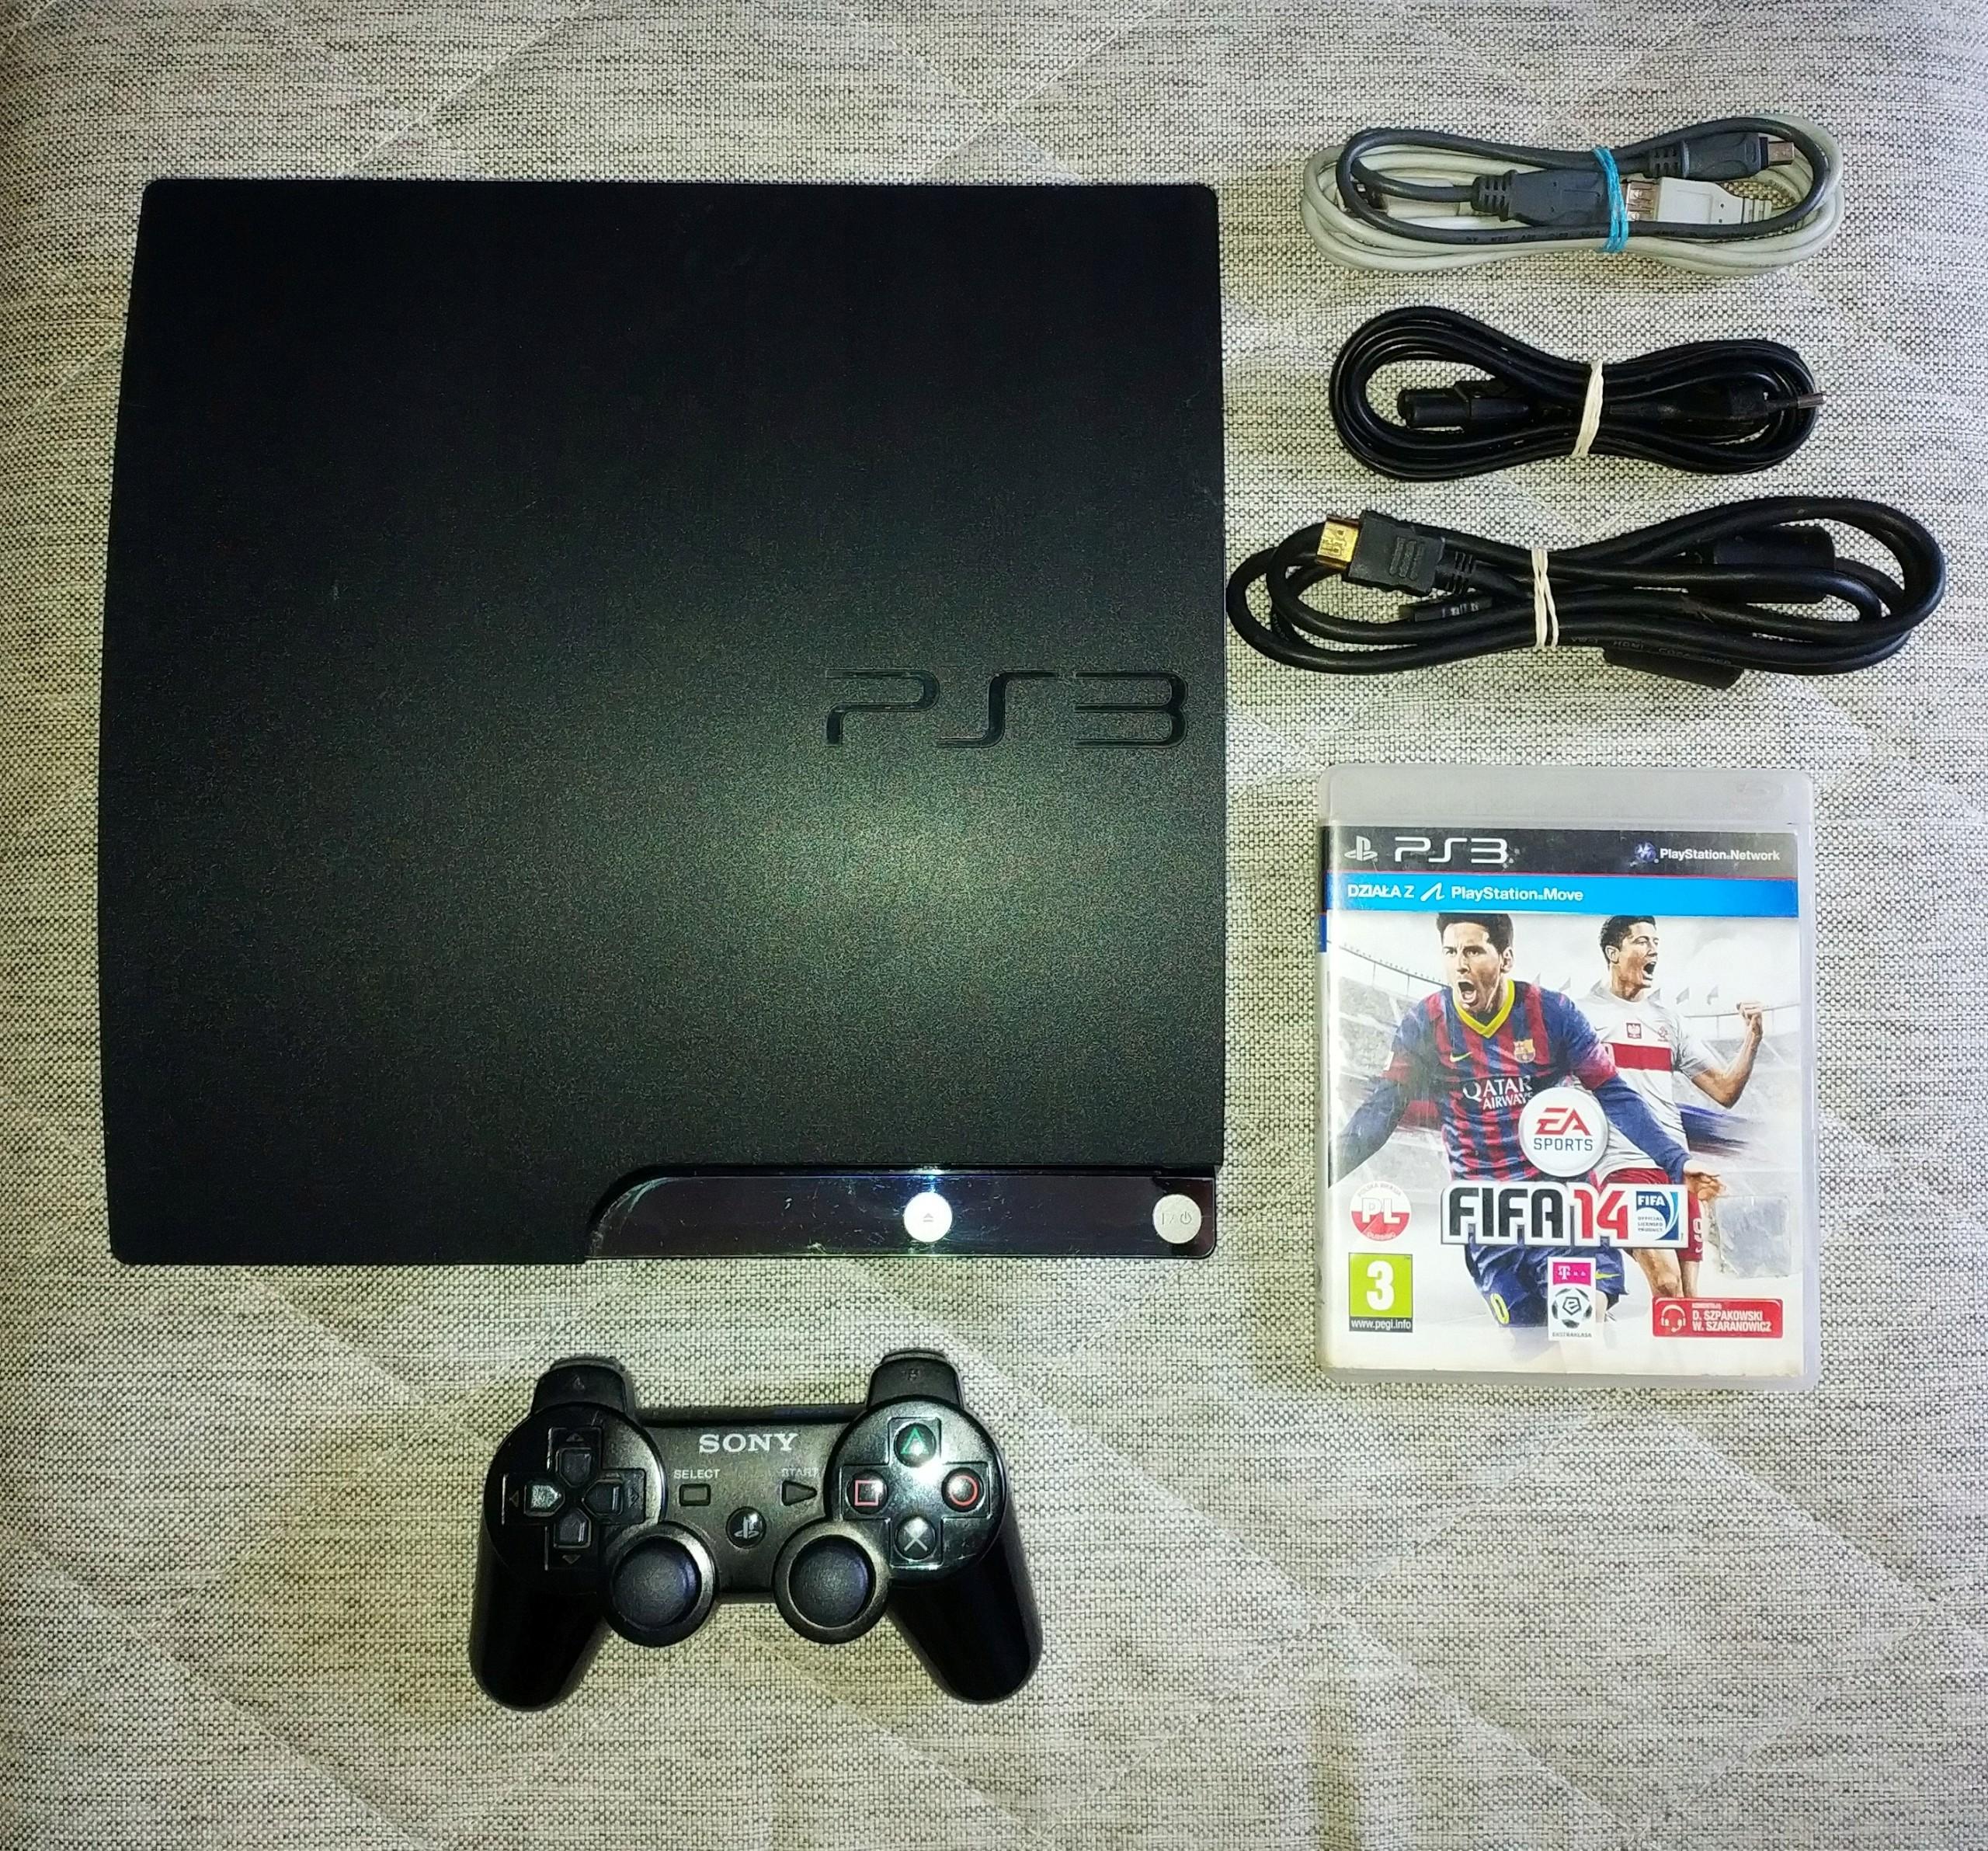 Sony Playstation 3ps3ps 3 Slim 320 Gb Cfw Daftar Harga Termurah Ps 20xxx Refurbish 480 Hdd Internal 120gb Ps3 320gb Soft 355 Przerobiona